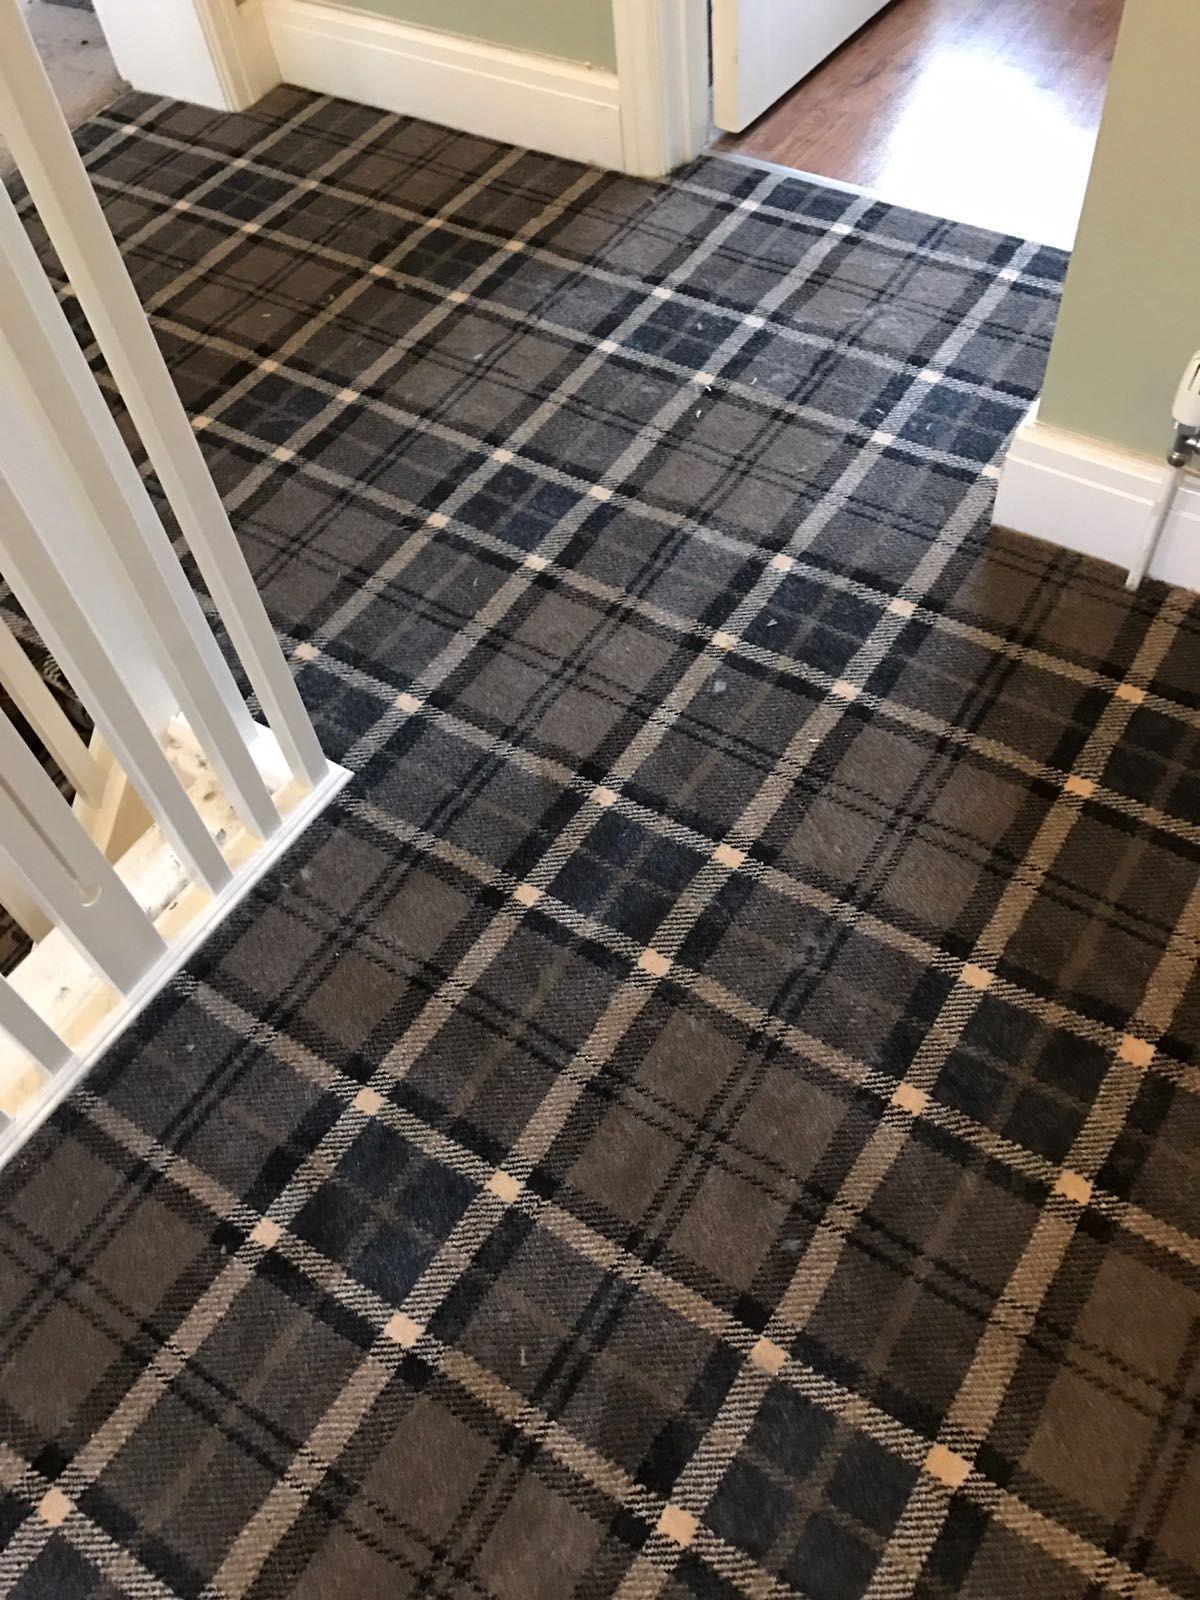 Nylon carpet images